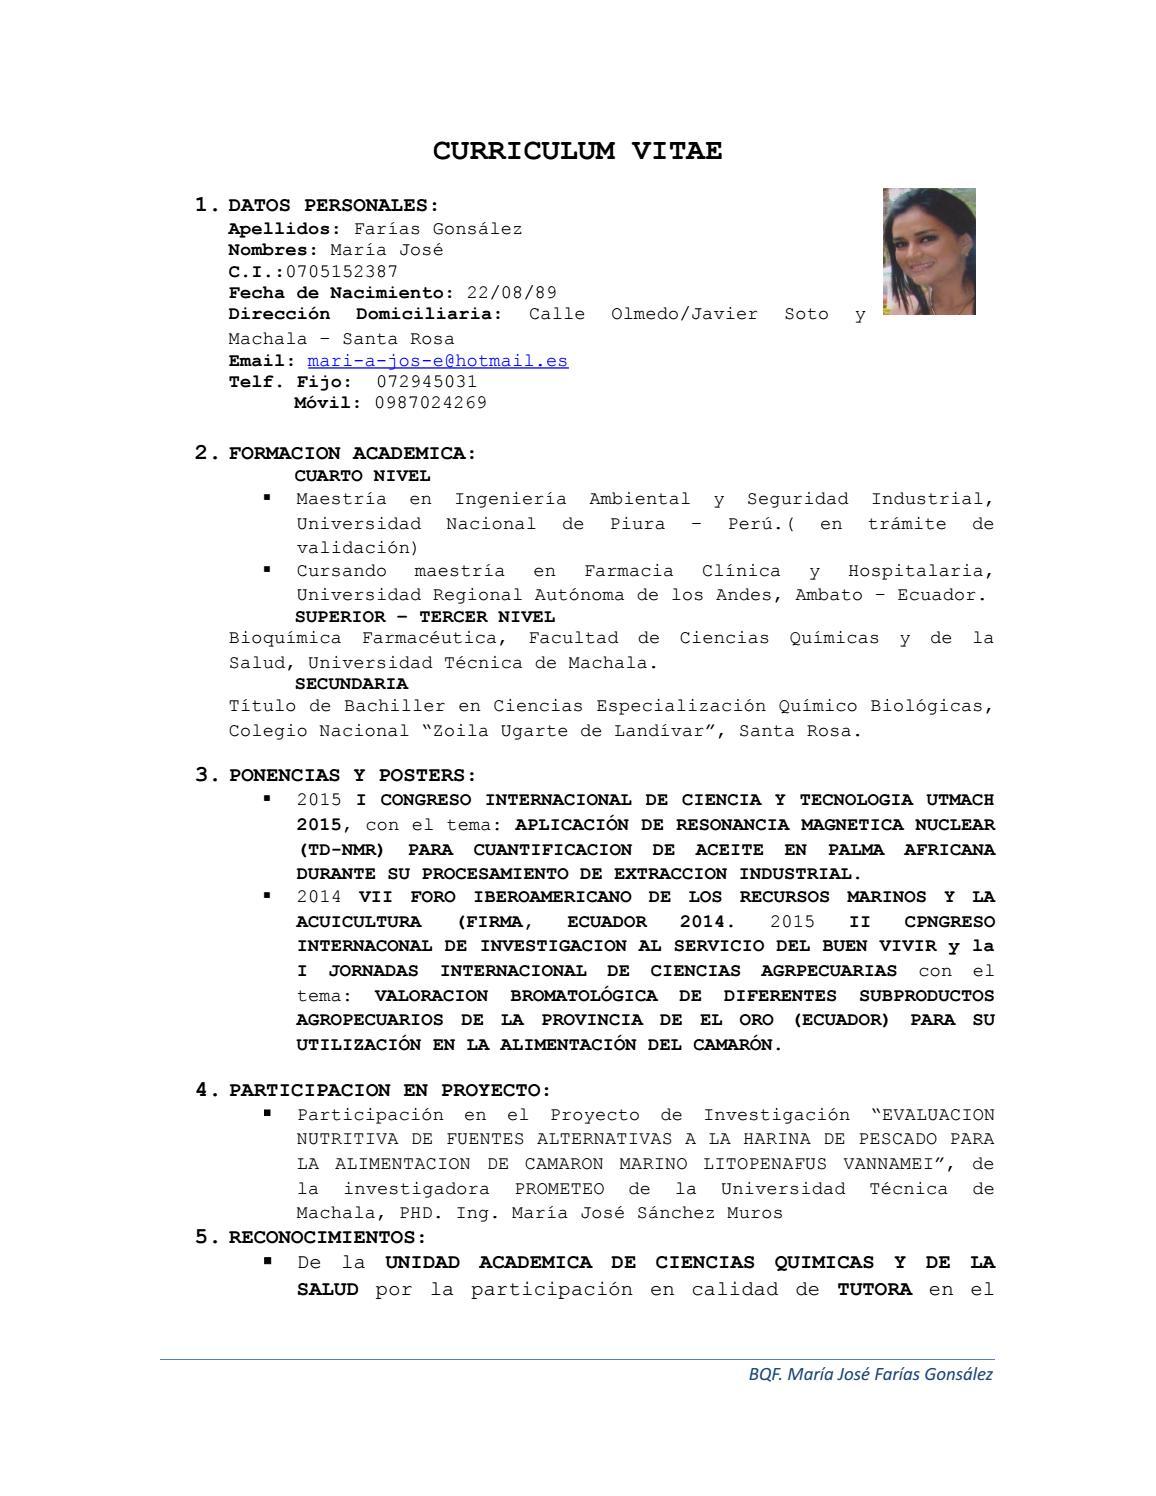 Cv Maria Jose Farias By Faustodutan2 Issuu